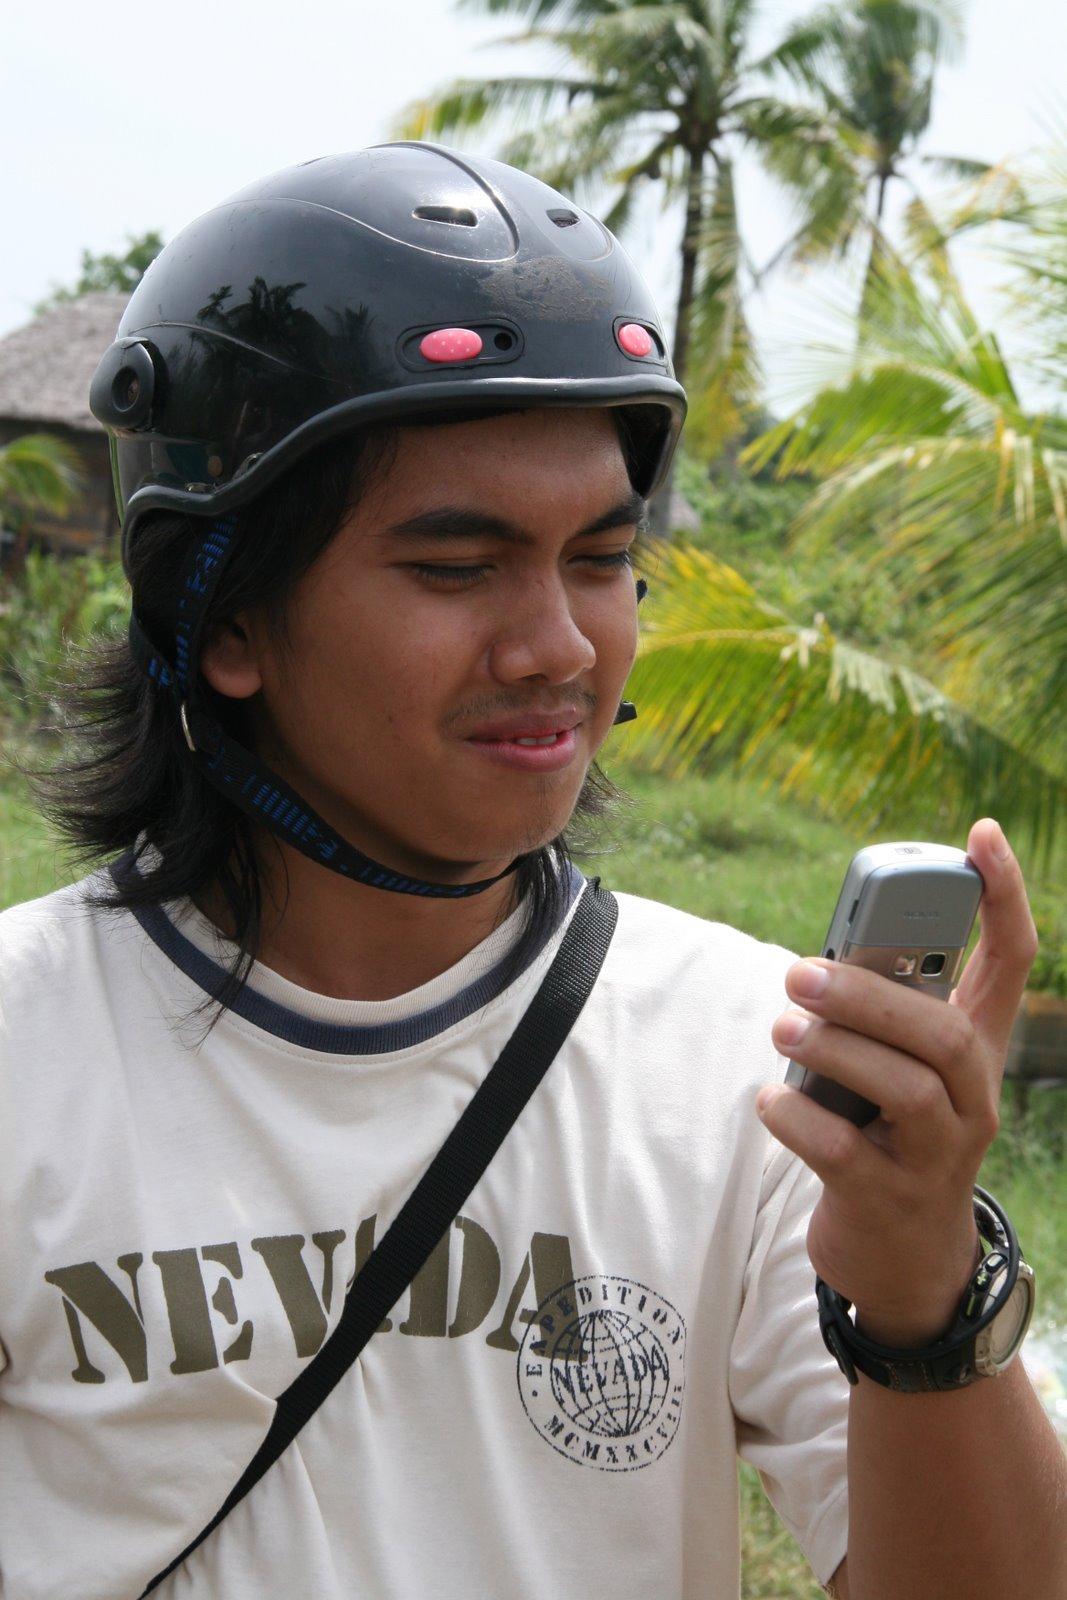 [mobile_phones]